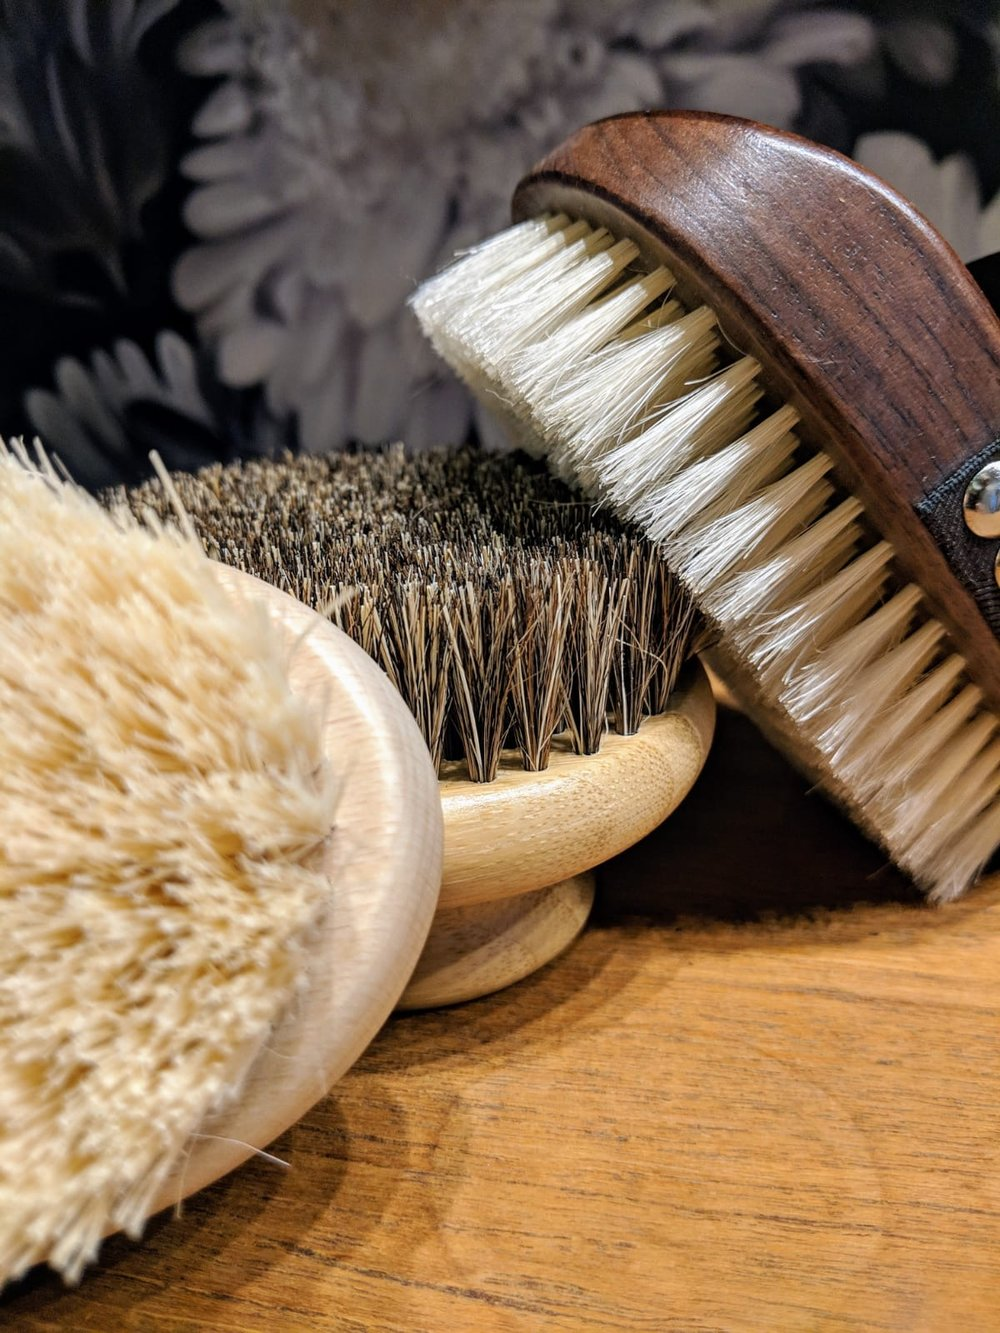 Dry skin brushes at Gazelli House South Kensington, London